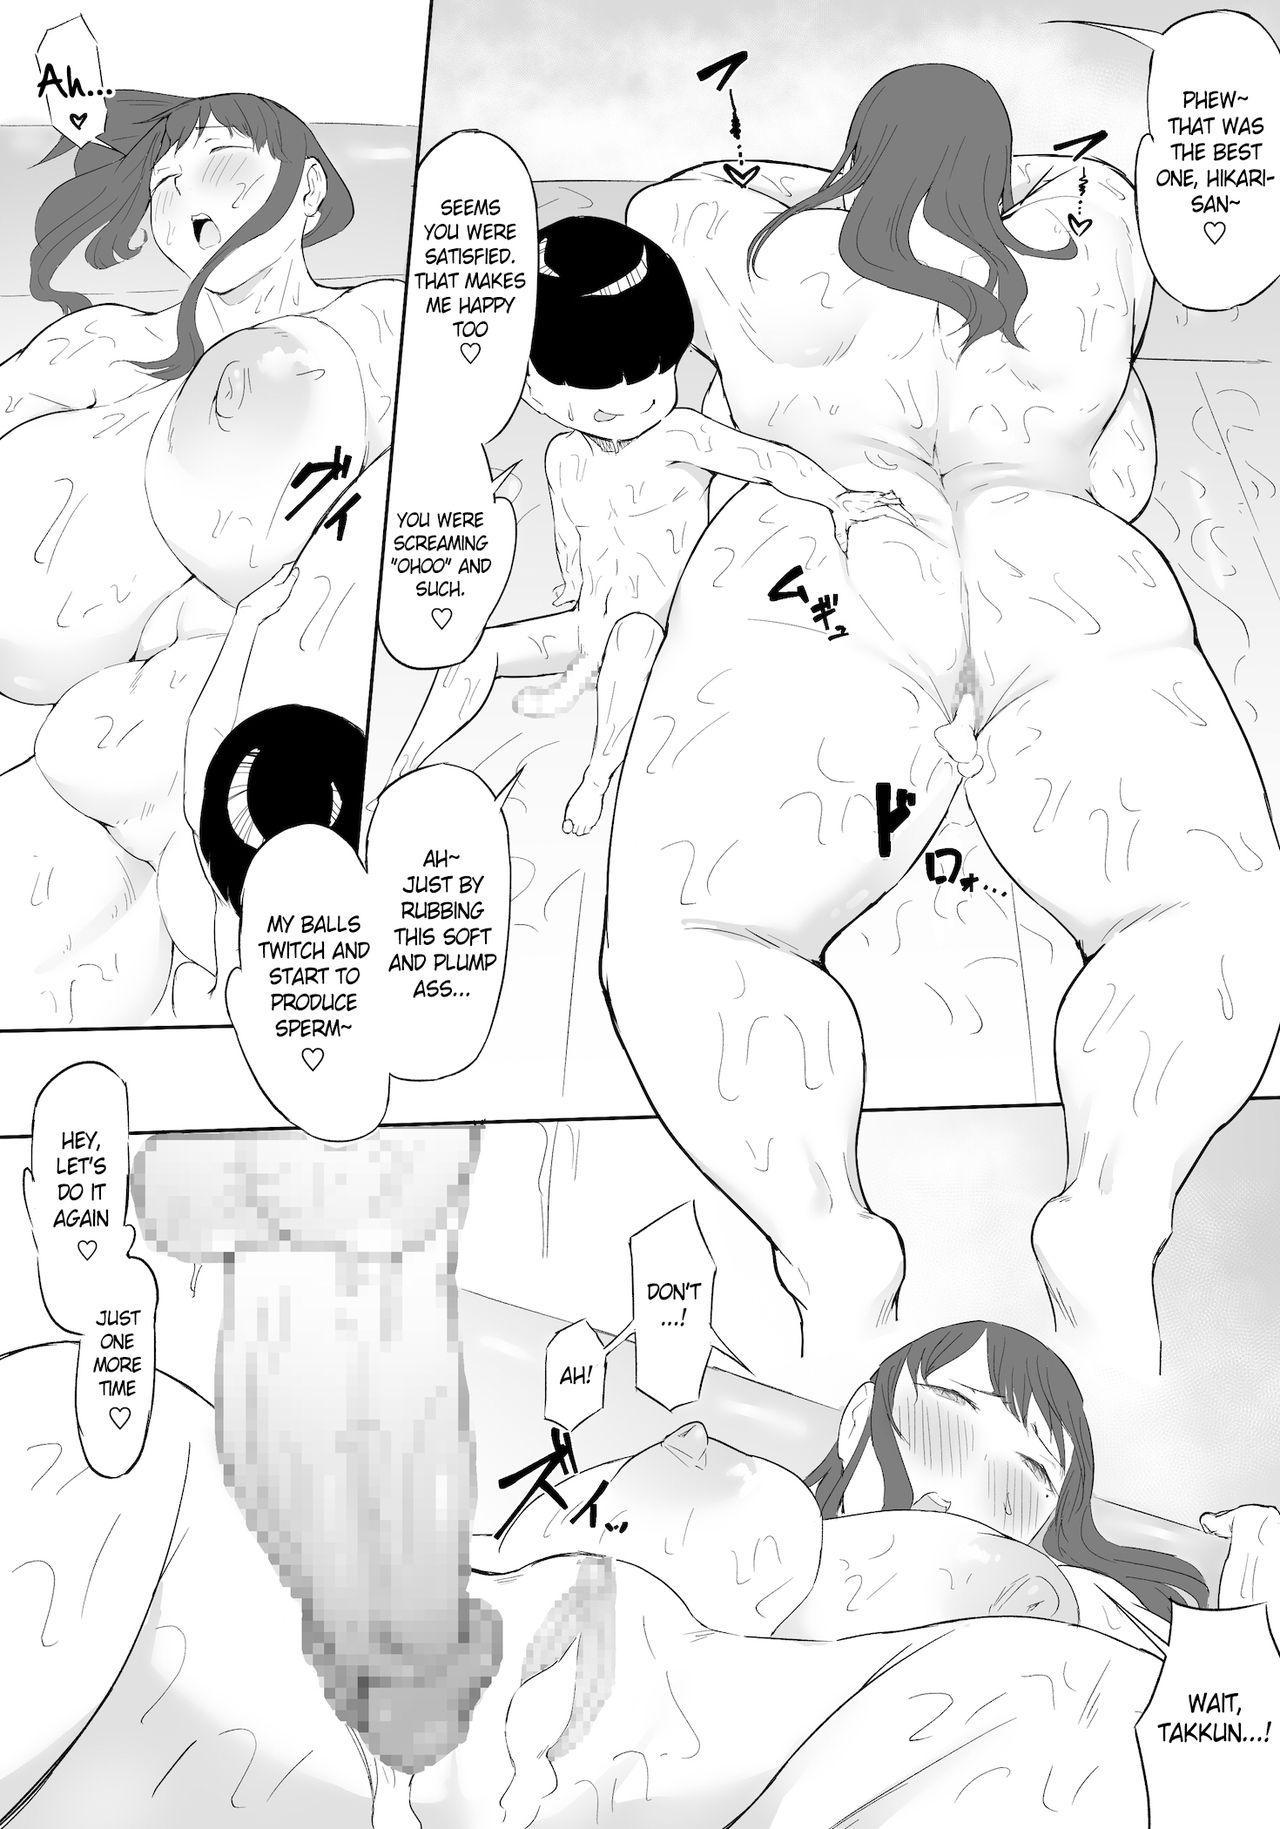 Boku wa Hero Paranoia Zenpen   I'm the Hero's Paranoia - Part 1 60